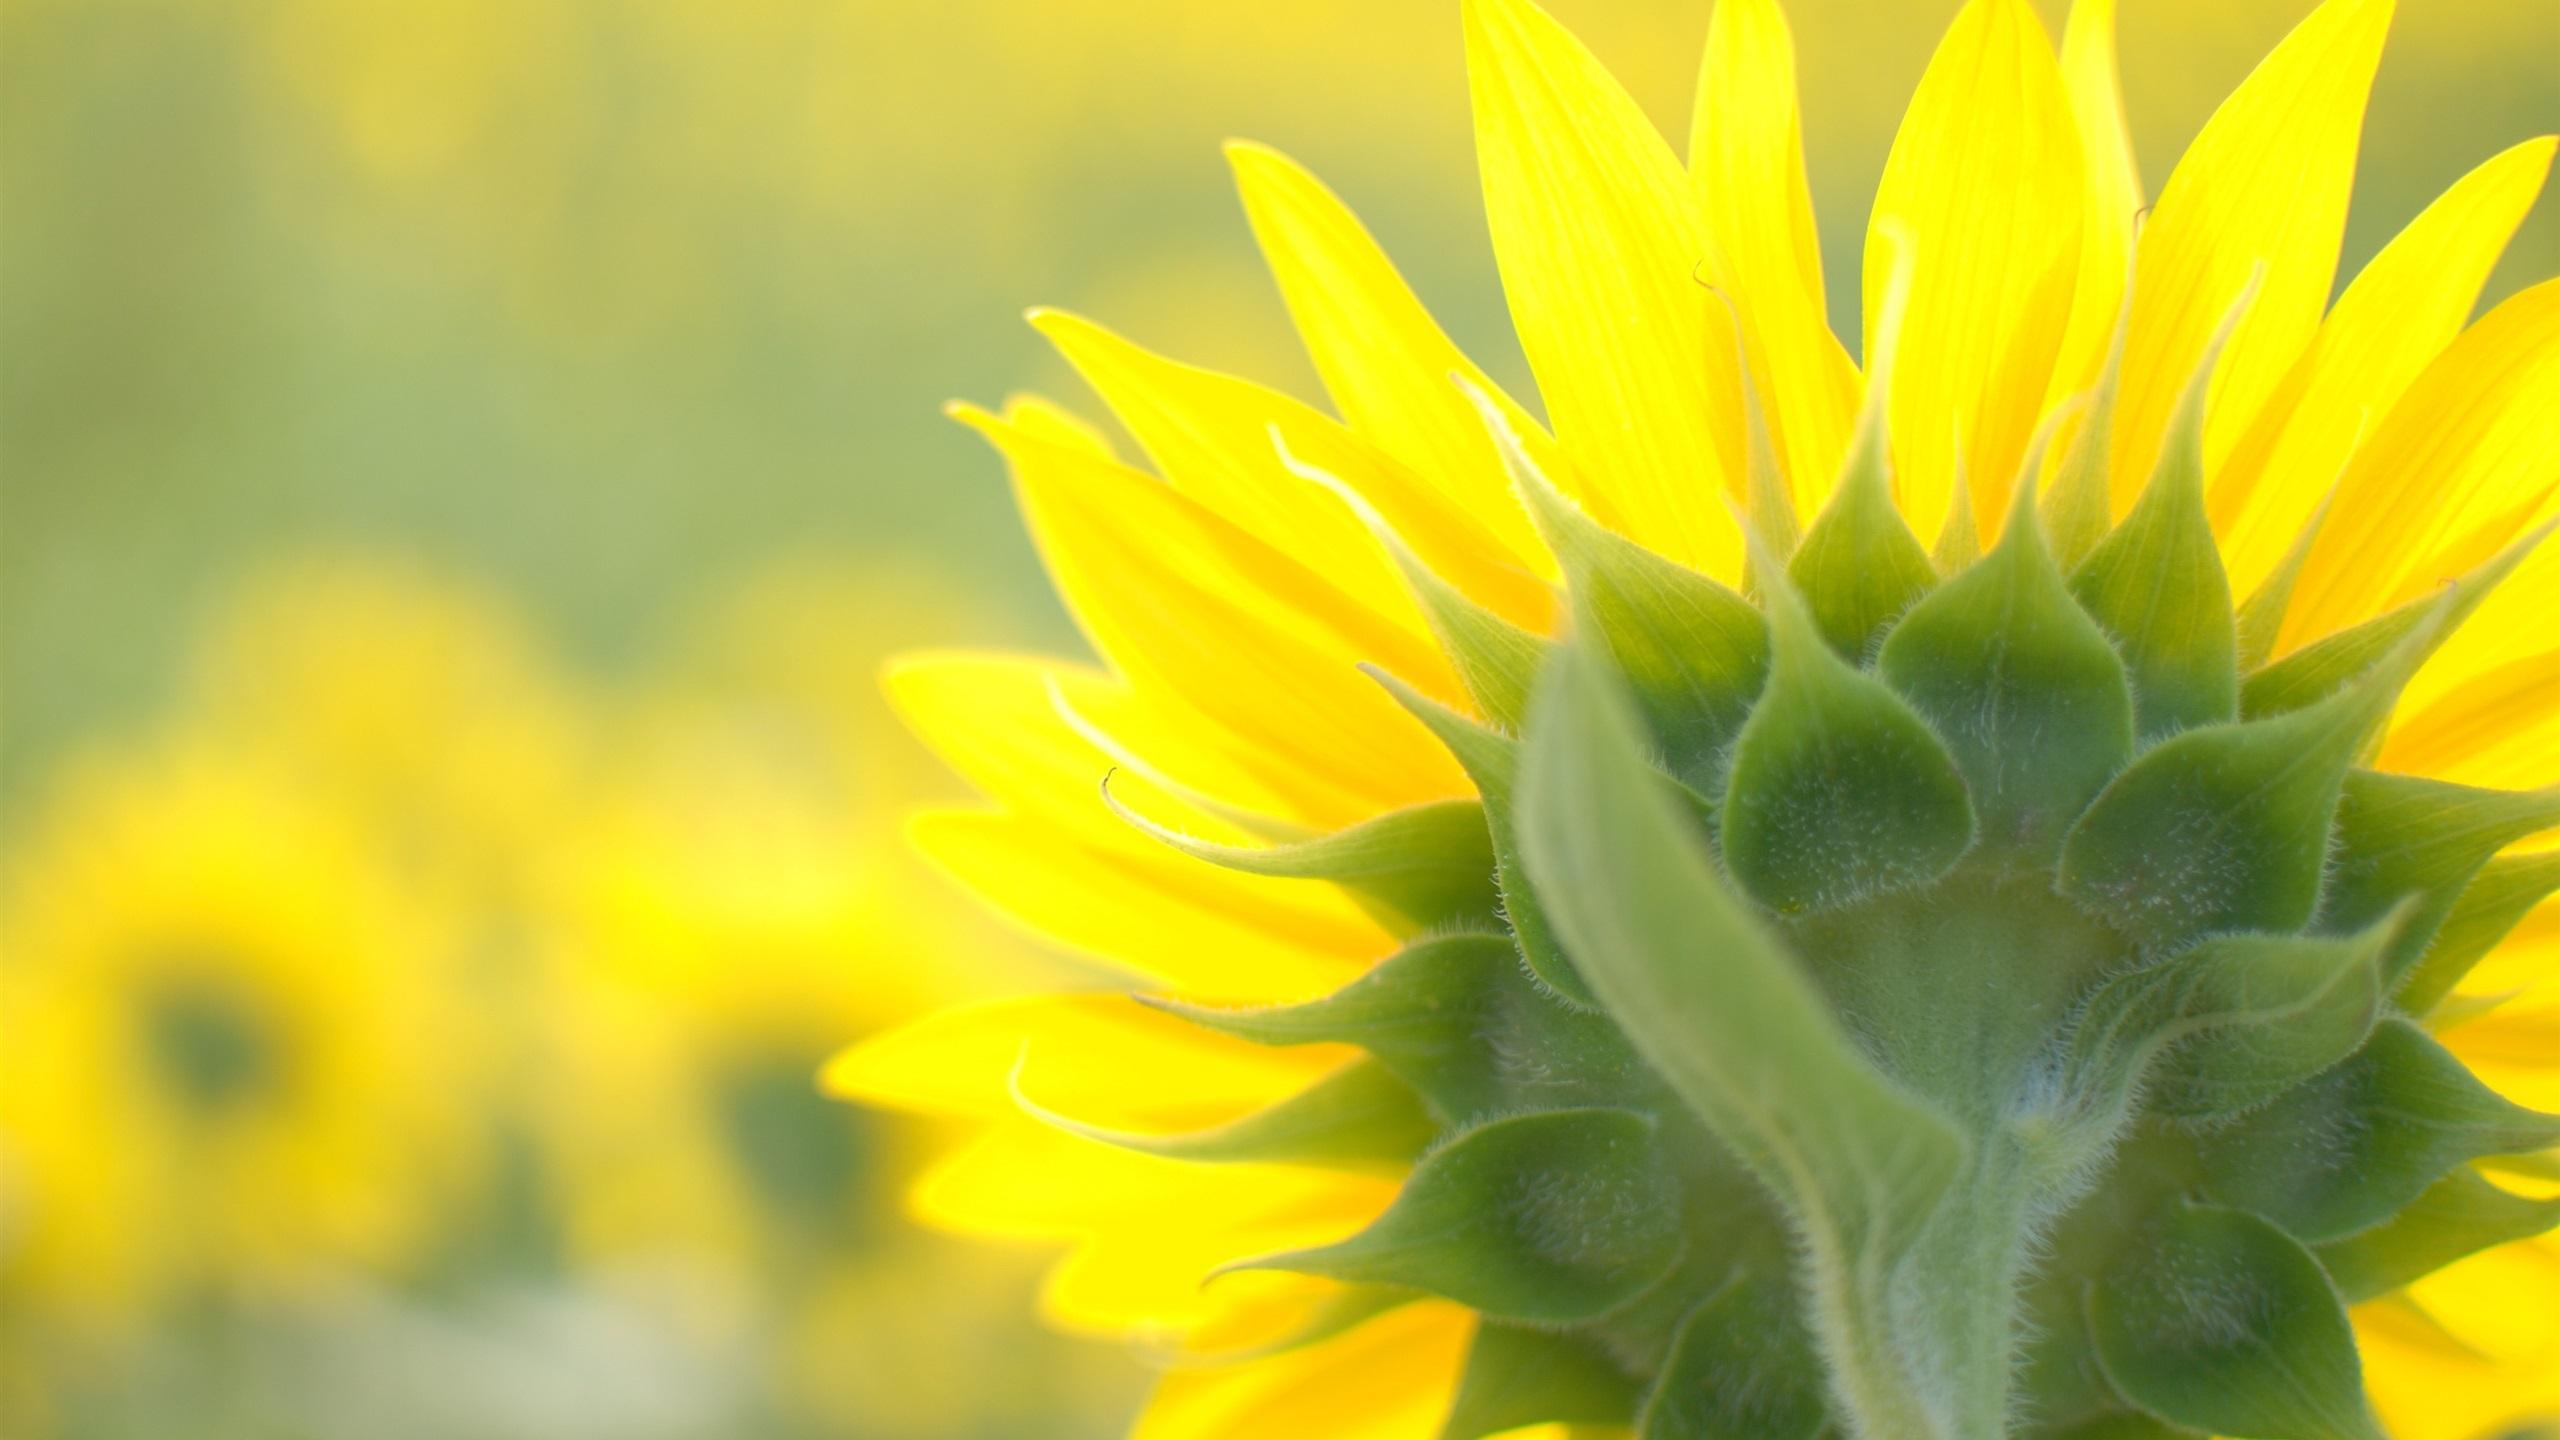 Fonds d 39 cran t l charger 2560x1440 sunflower close up for Fond ecran qhd